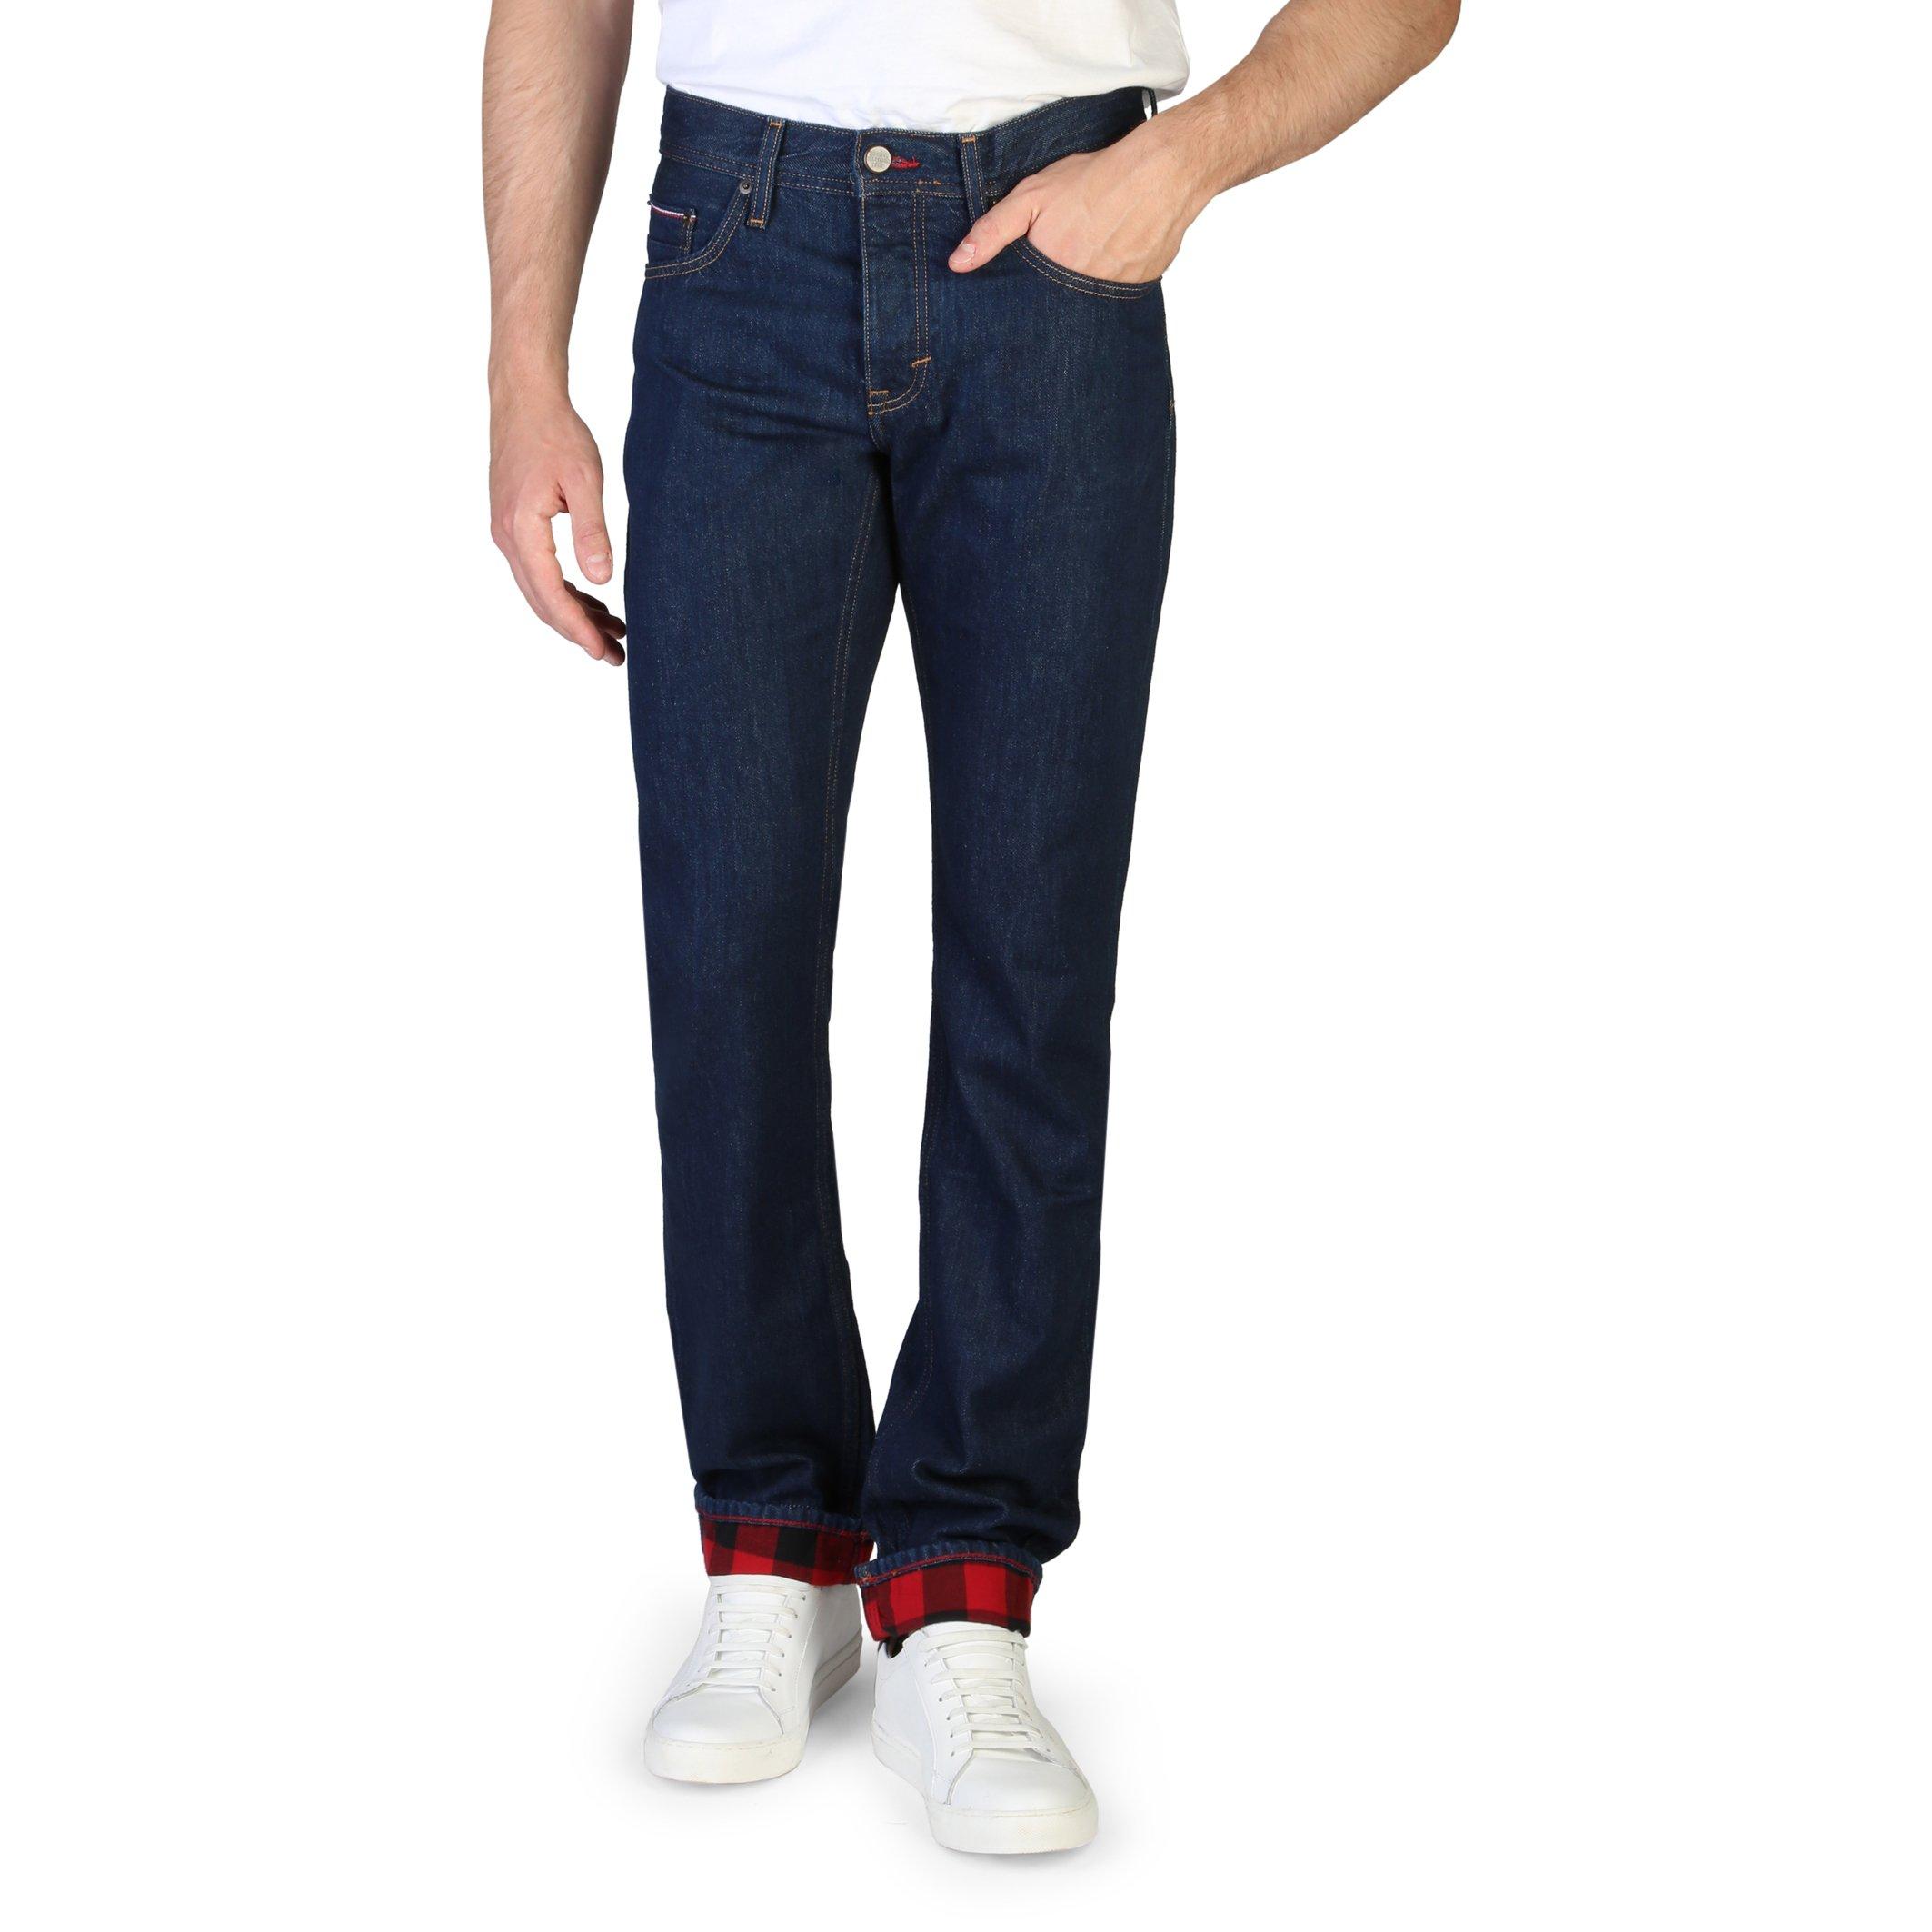 Tommy Hilfiger Men's Jeans Blue MW0MW08115 - blue-2 31